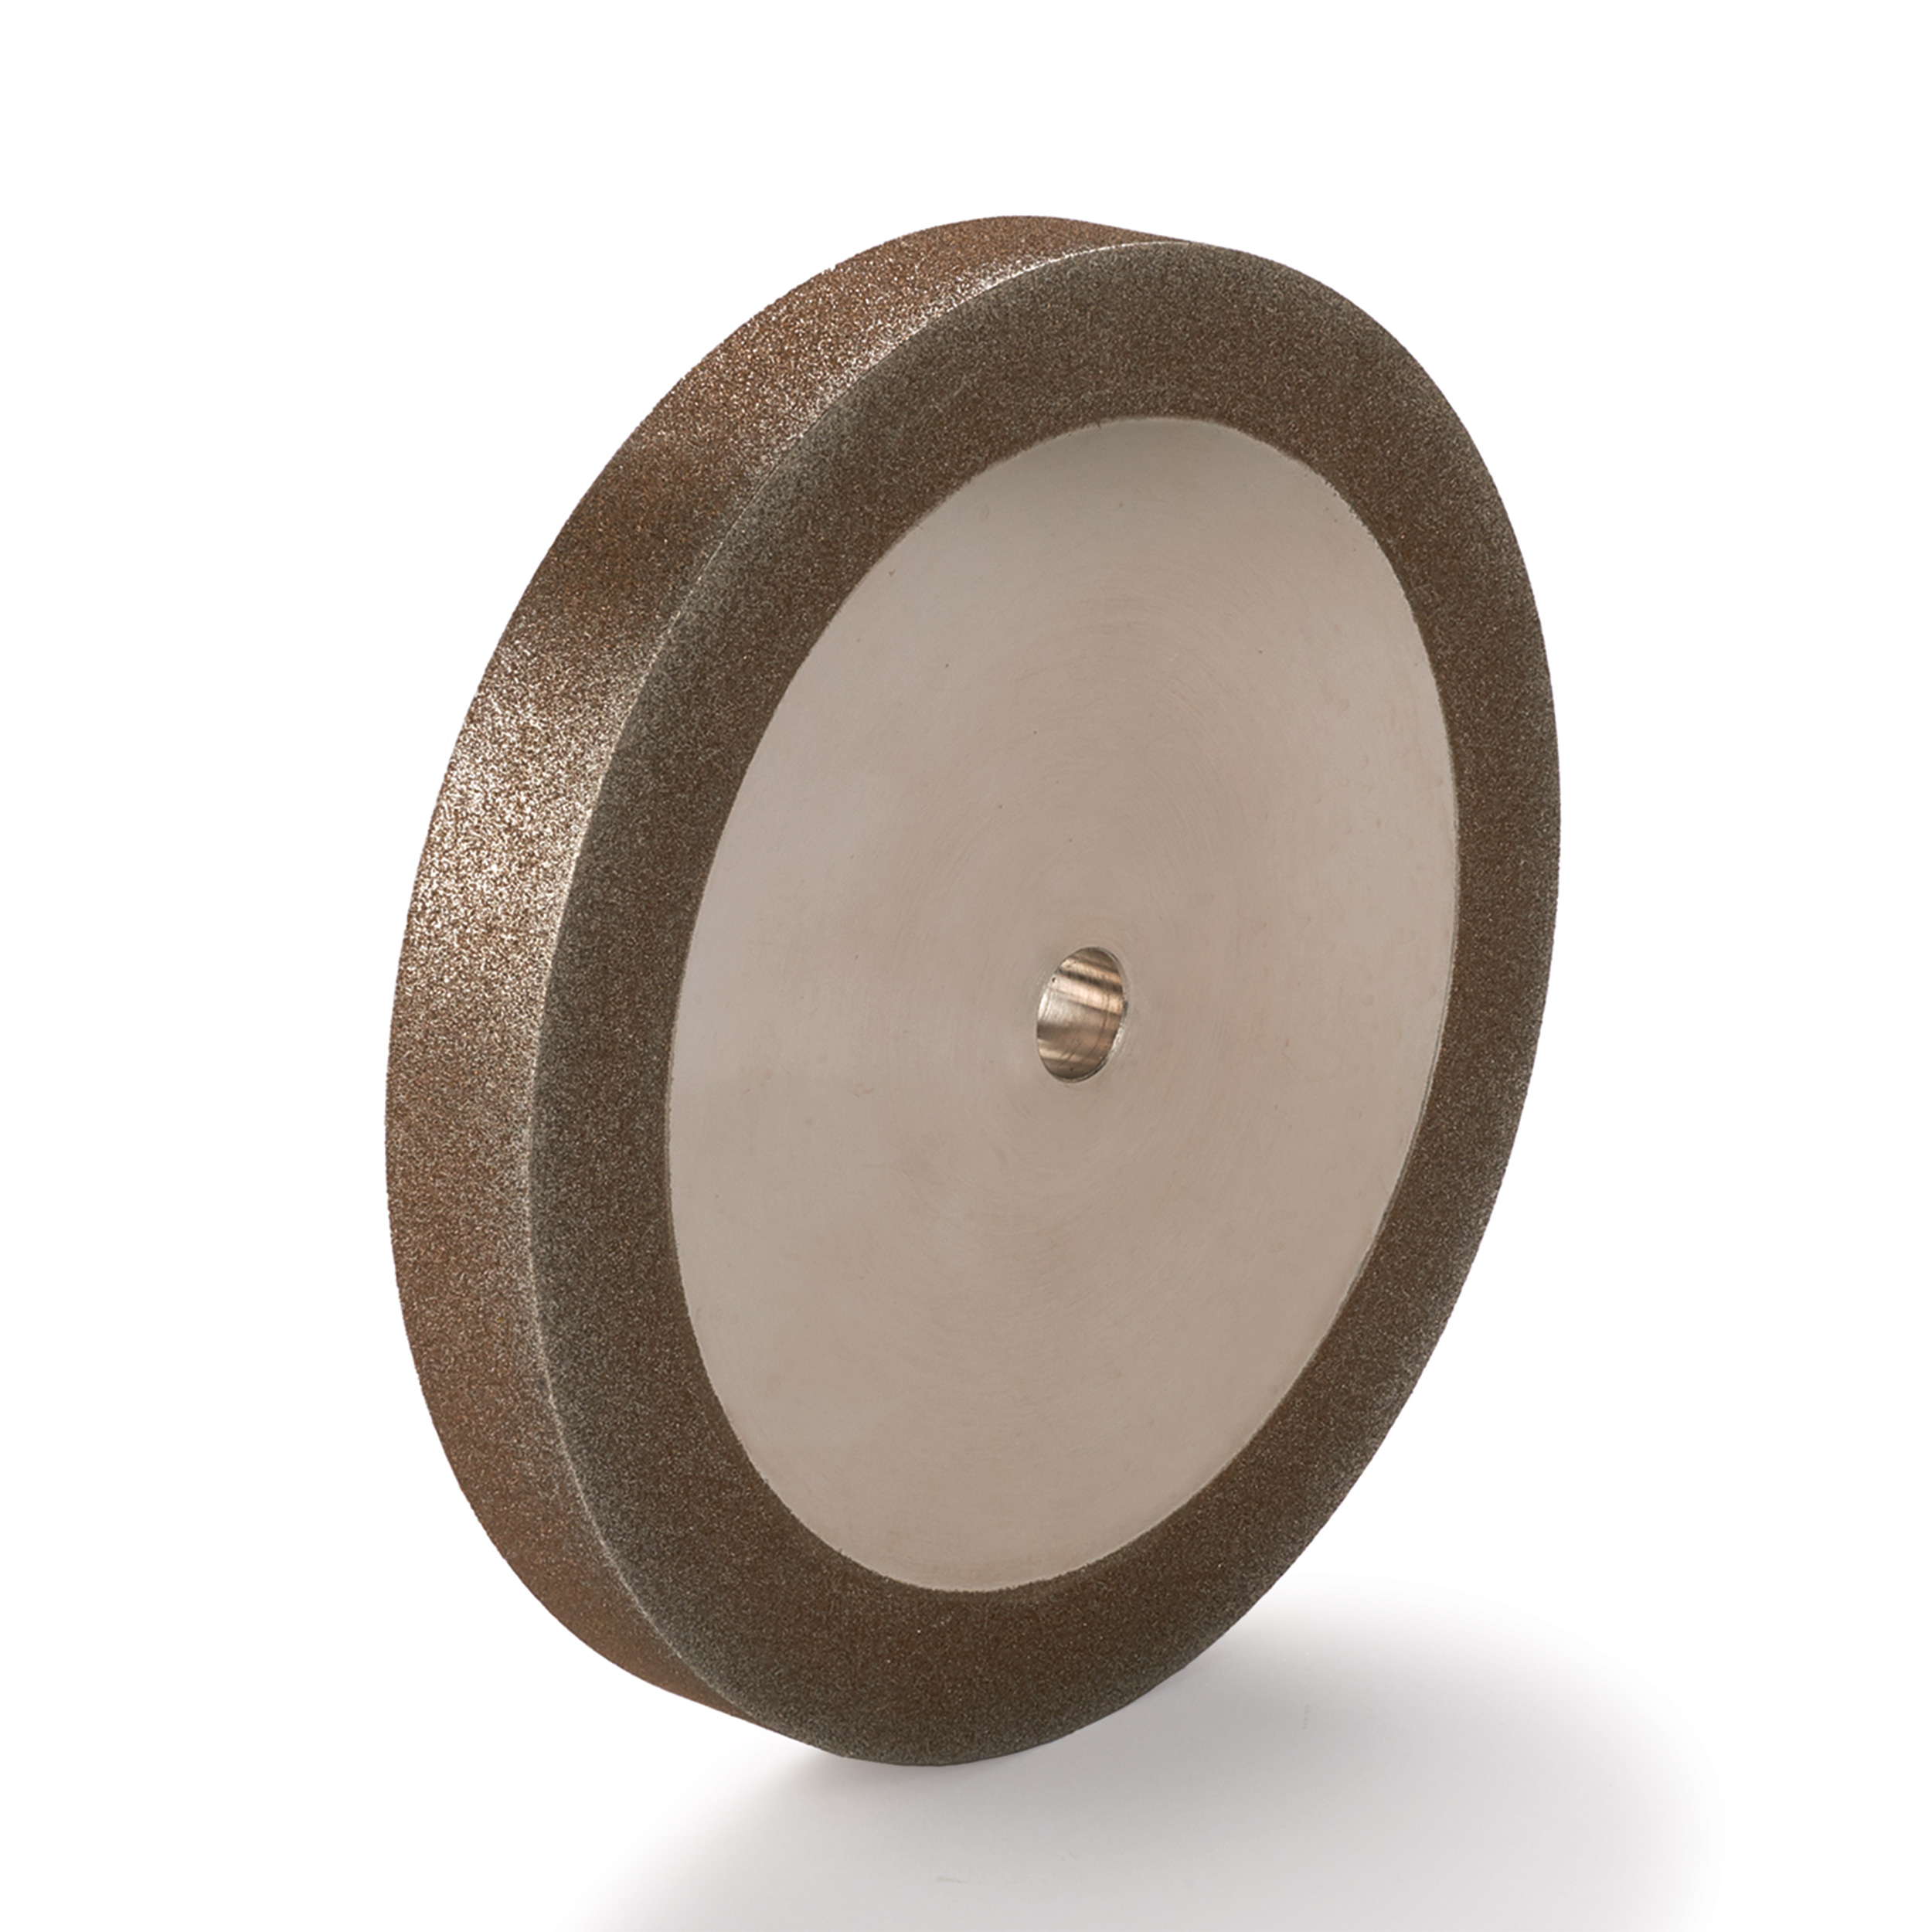 WoodRiver 120-Grit CBN Grinding Wheel, 6